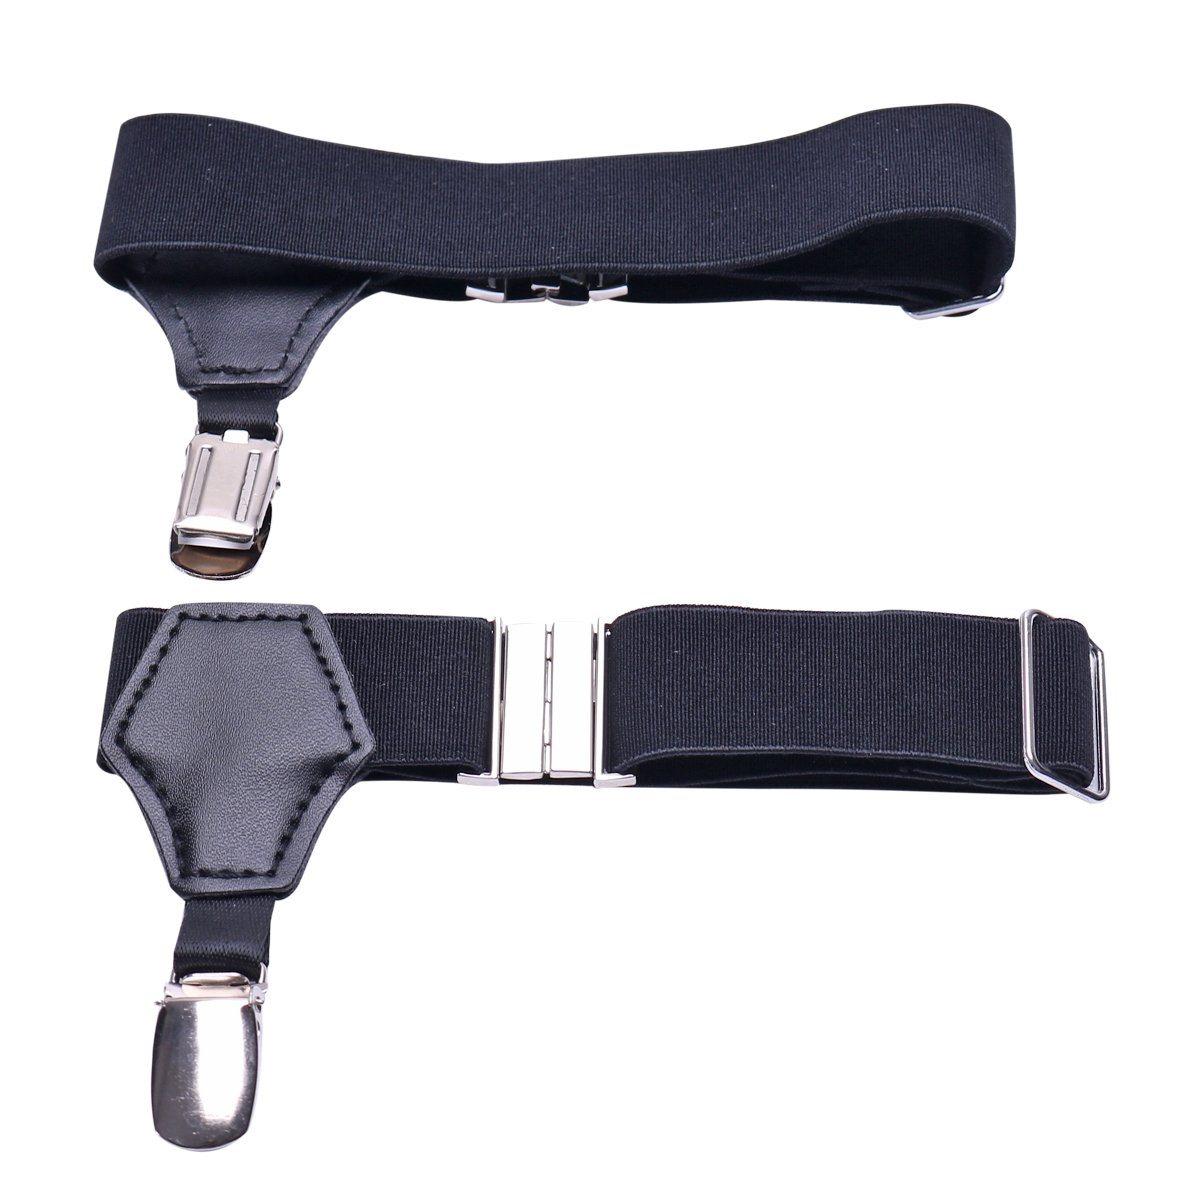 5c78a69a375 iiniim Men s Non-slip Sock Garter Belt Holders Suspender Strap with Metal  Clips at Amazon Men s Clothing store